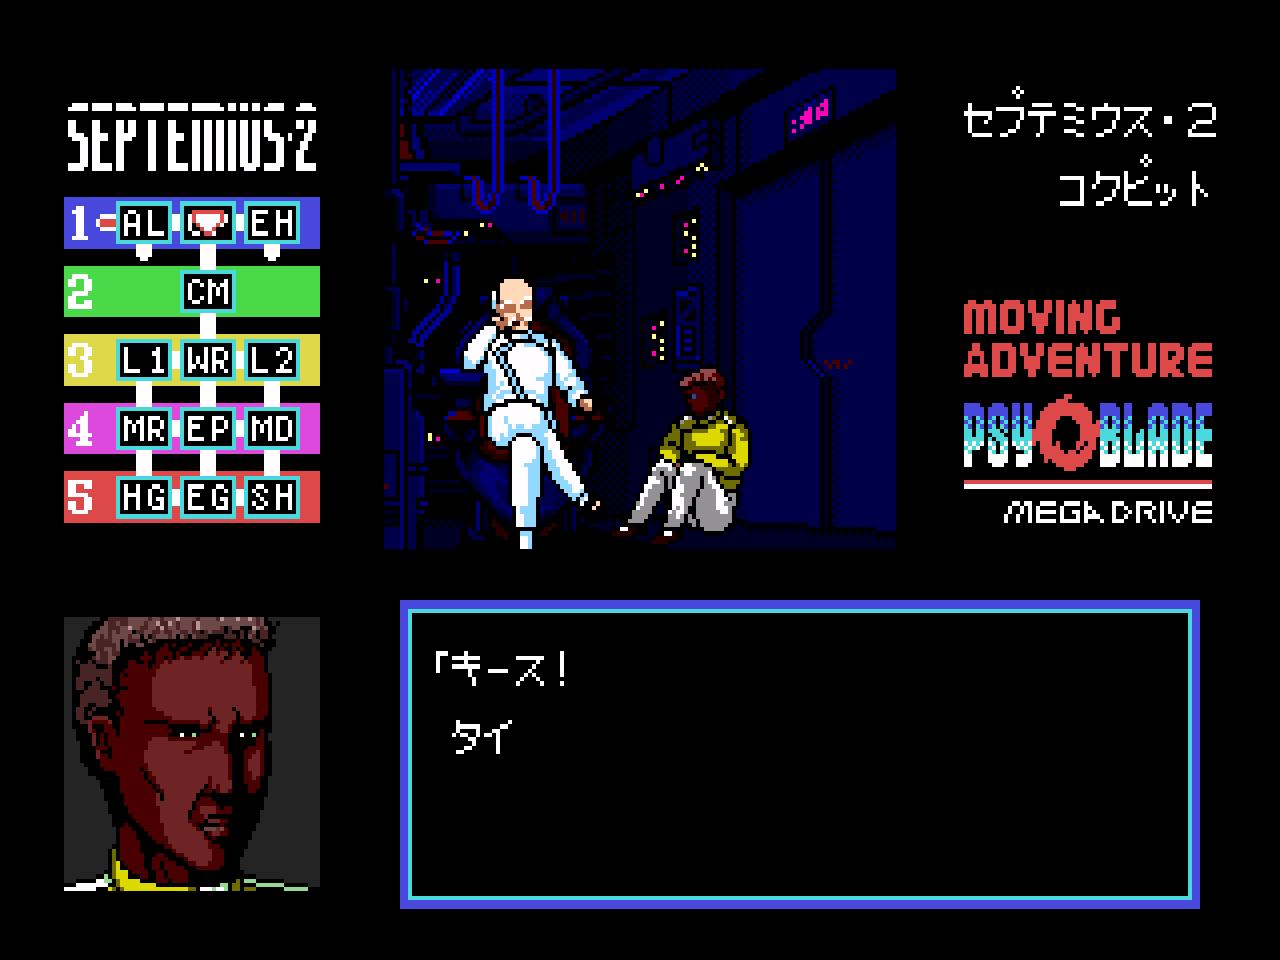 Psy O Blade Moving Adventure Download Game Gamefabrique